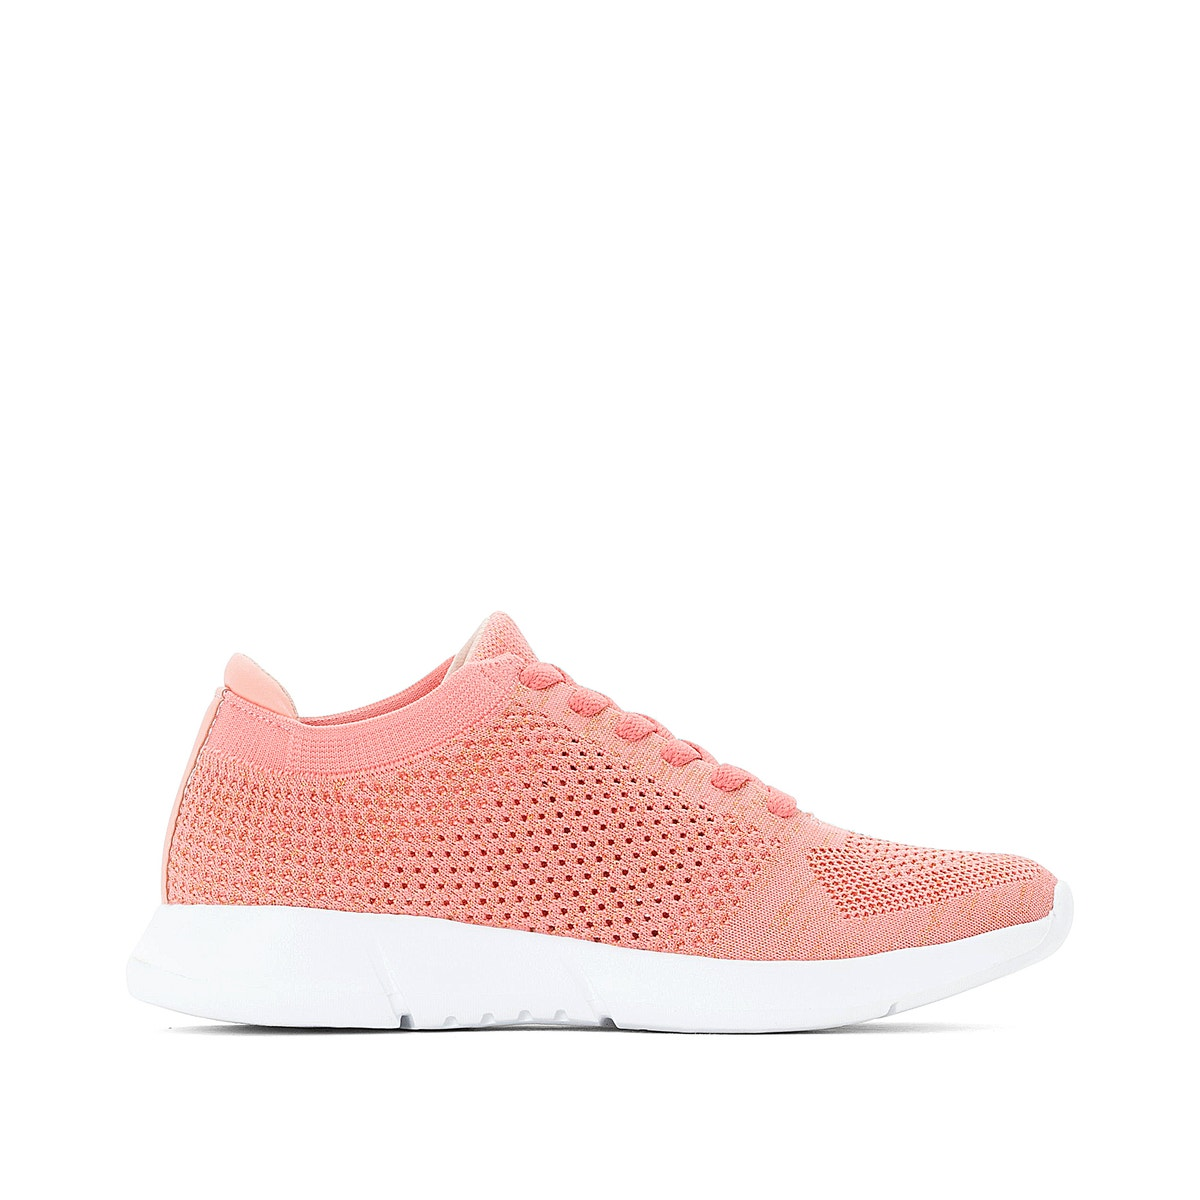 La Redoute Collections - La Redoute Collections Sneakers, 36-42 350140463 - 8578